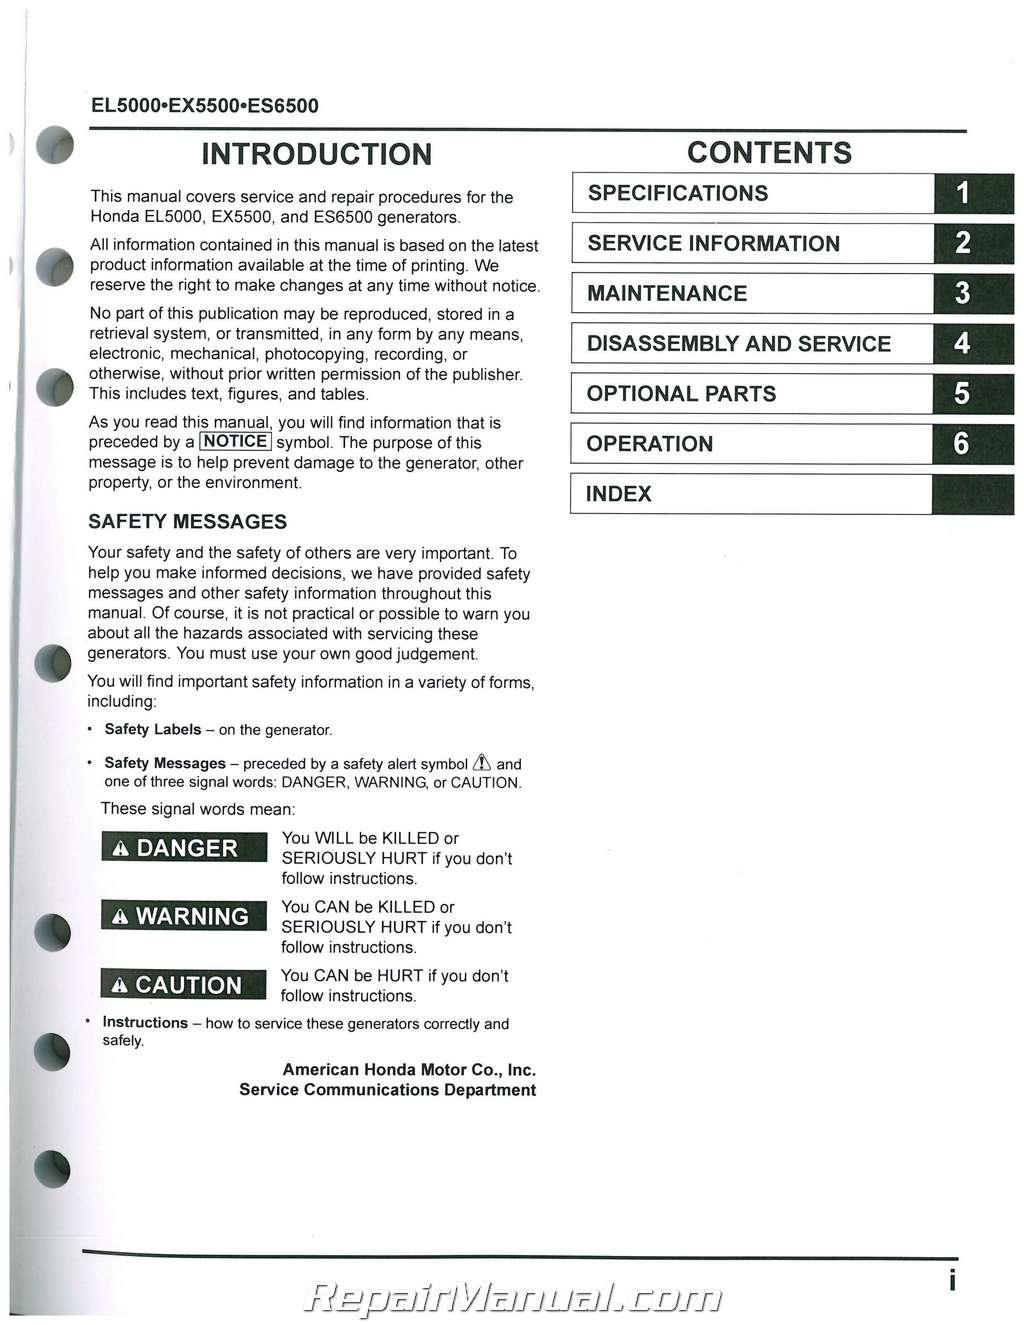 honda el5000 es6500 ex5500 generator shop manual rh repairmanual com honda generator es6500 owner's manual honda es6500 generator service manual